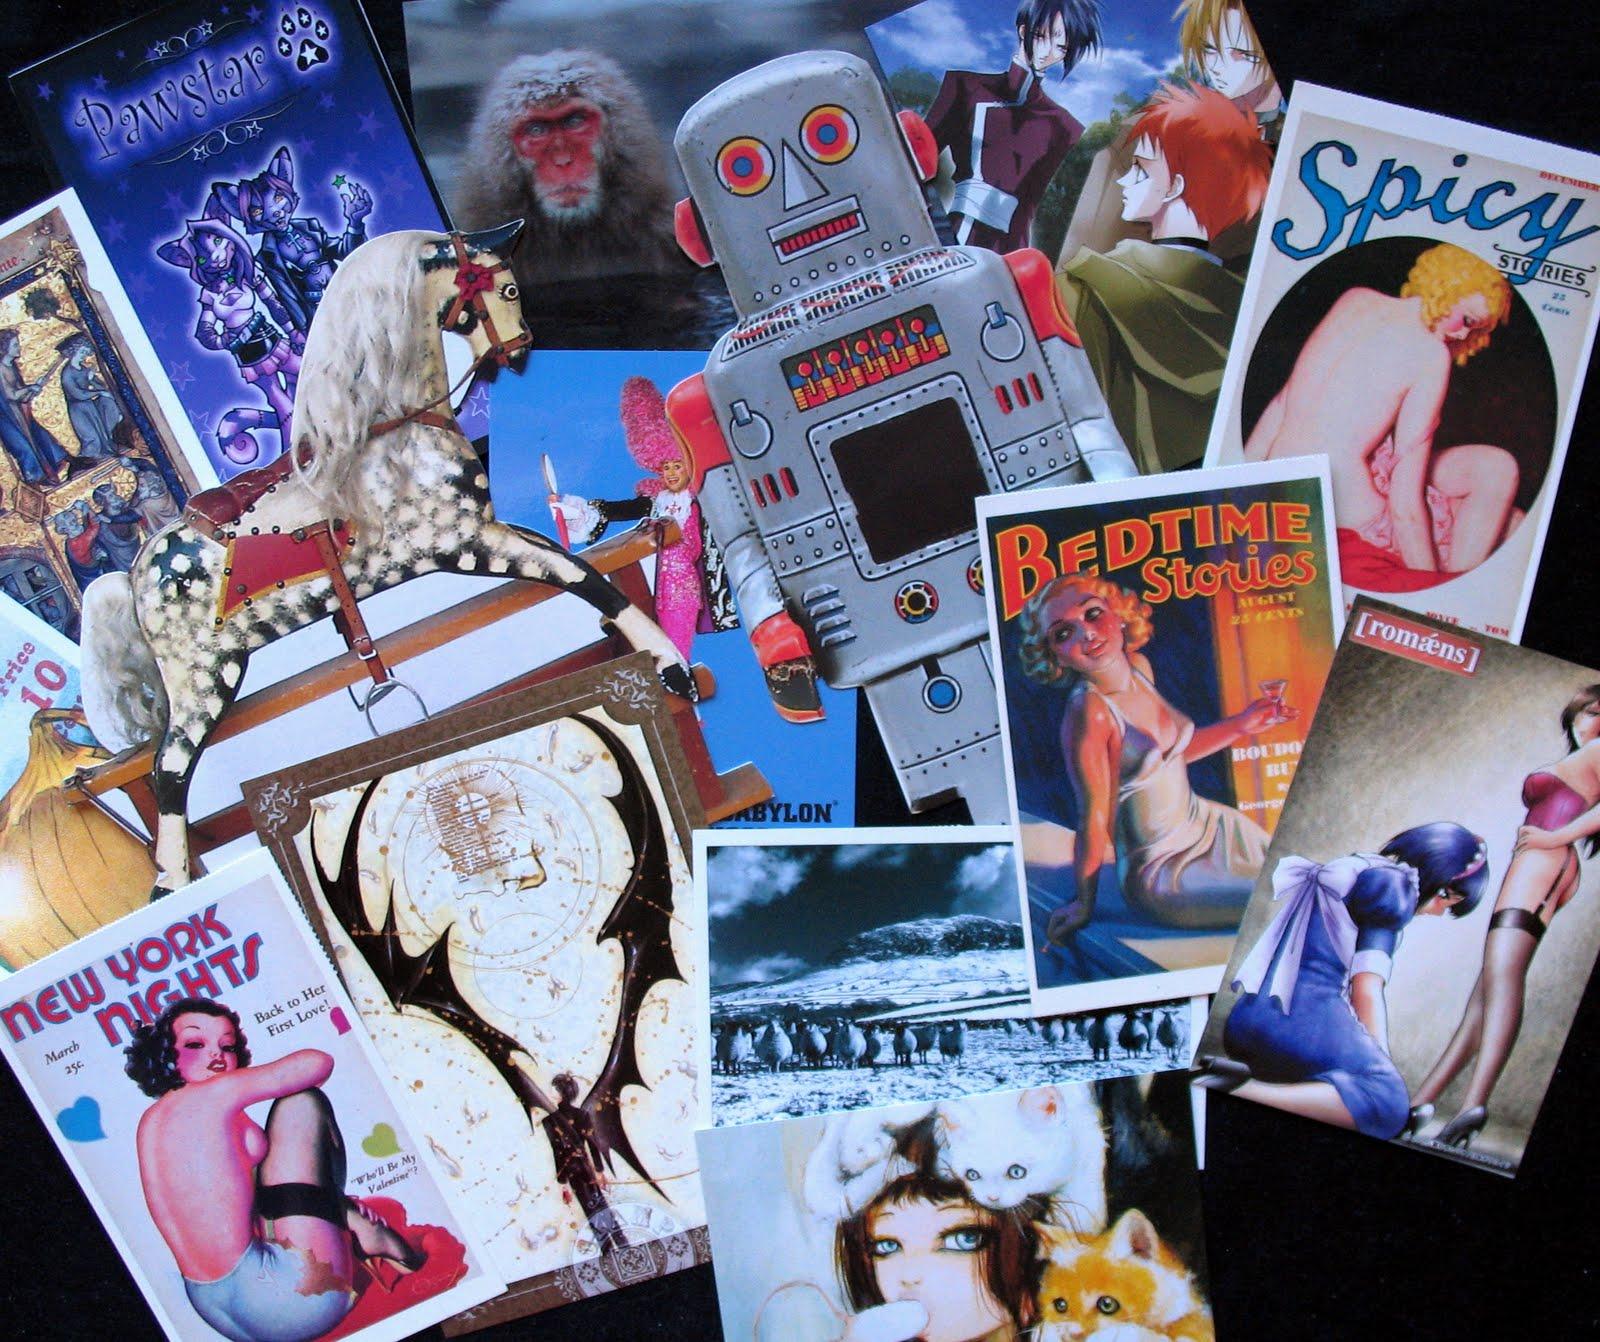 http://3.bp.blogspot.com/-fhMEzlnhyYg/TpzRreTvHpI/AAAAAAAALxo/iOaSOtjtkoc/s1600/postcards%2B1.jpg